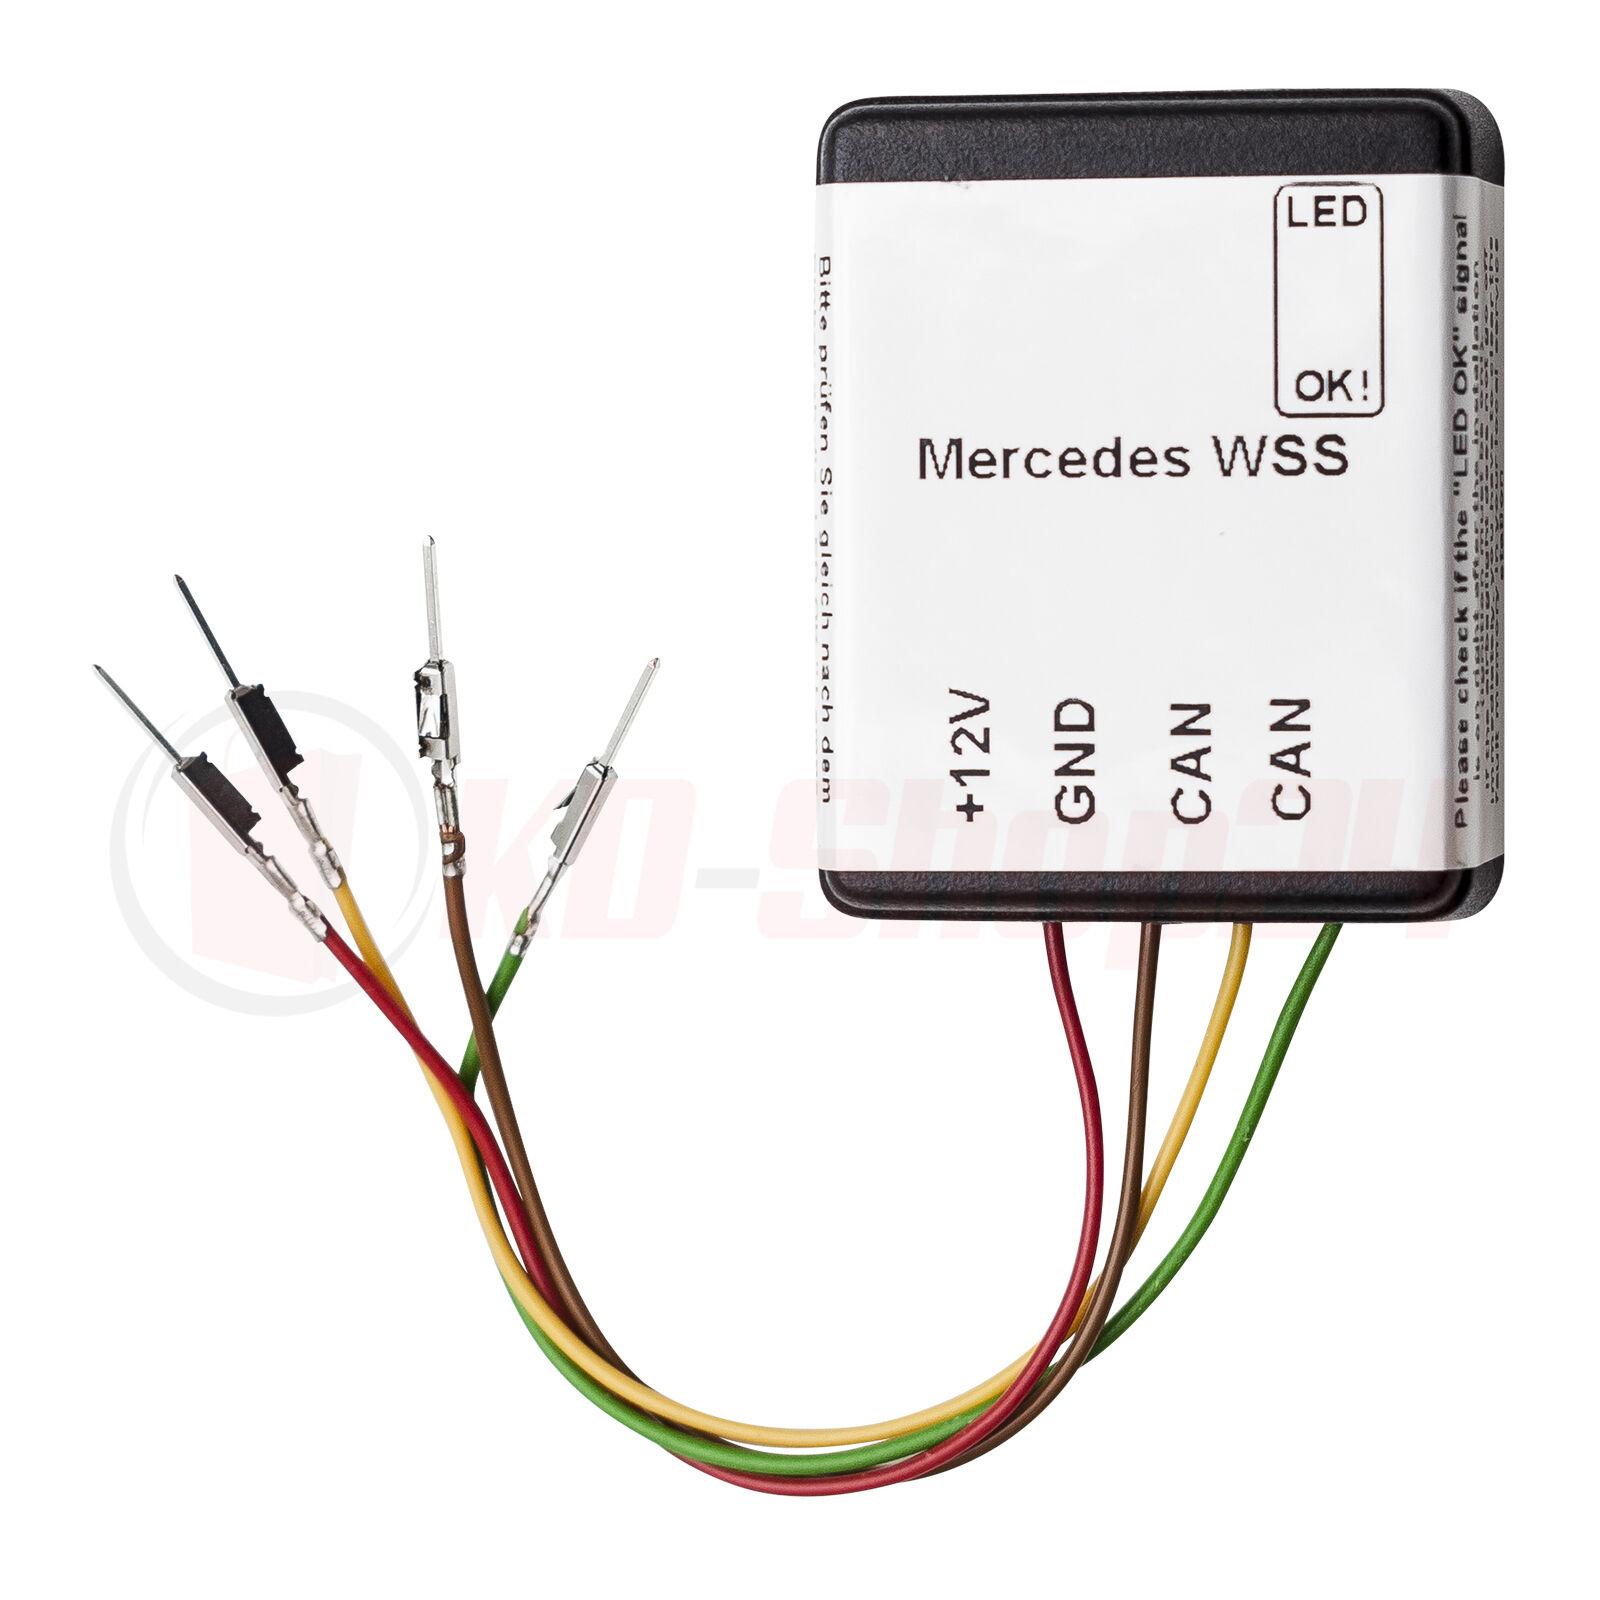 mercedes benz wss system seat occupancy detector seat sensor